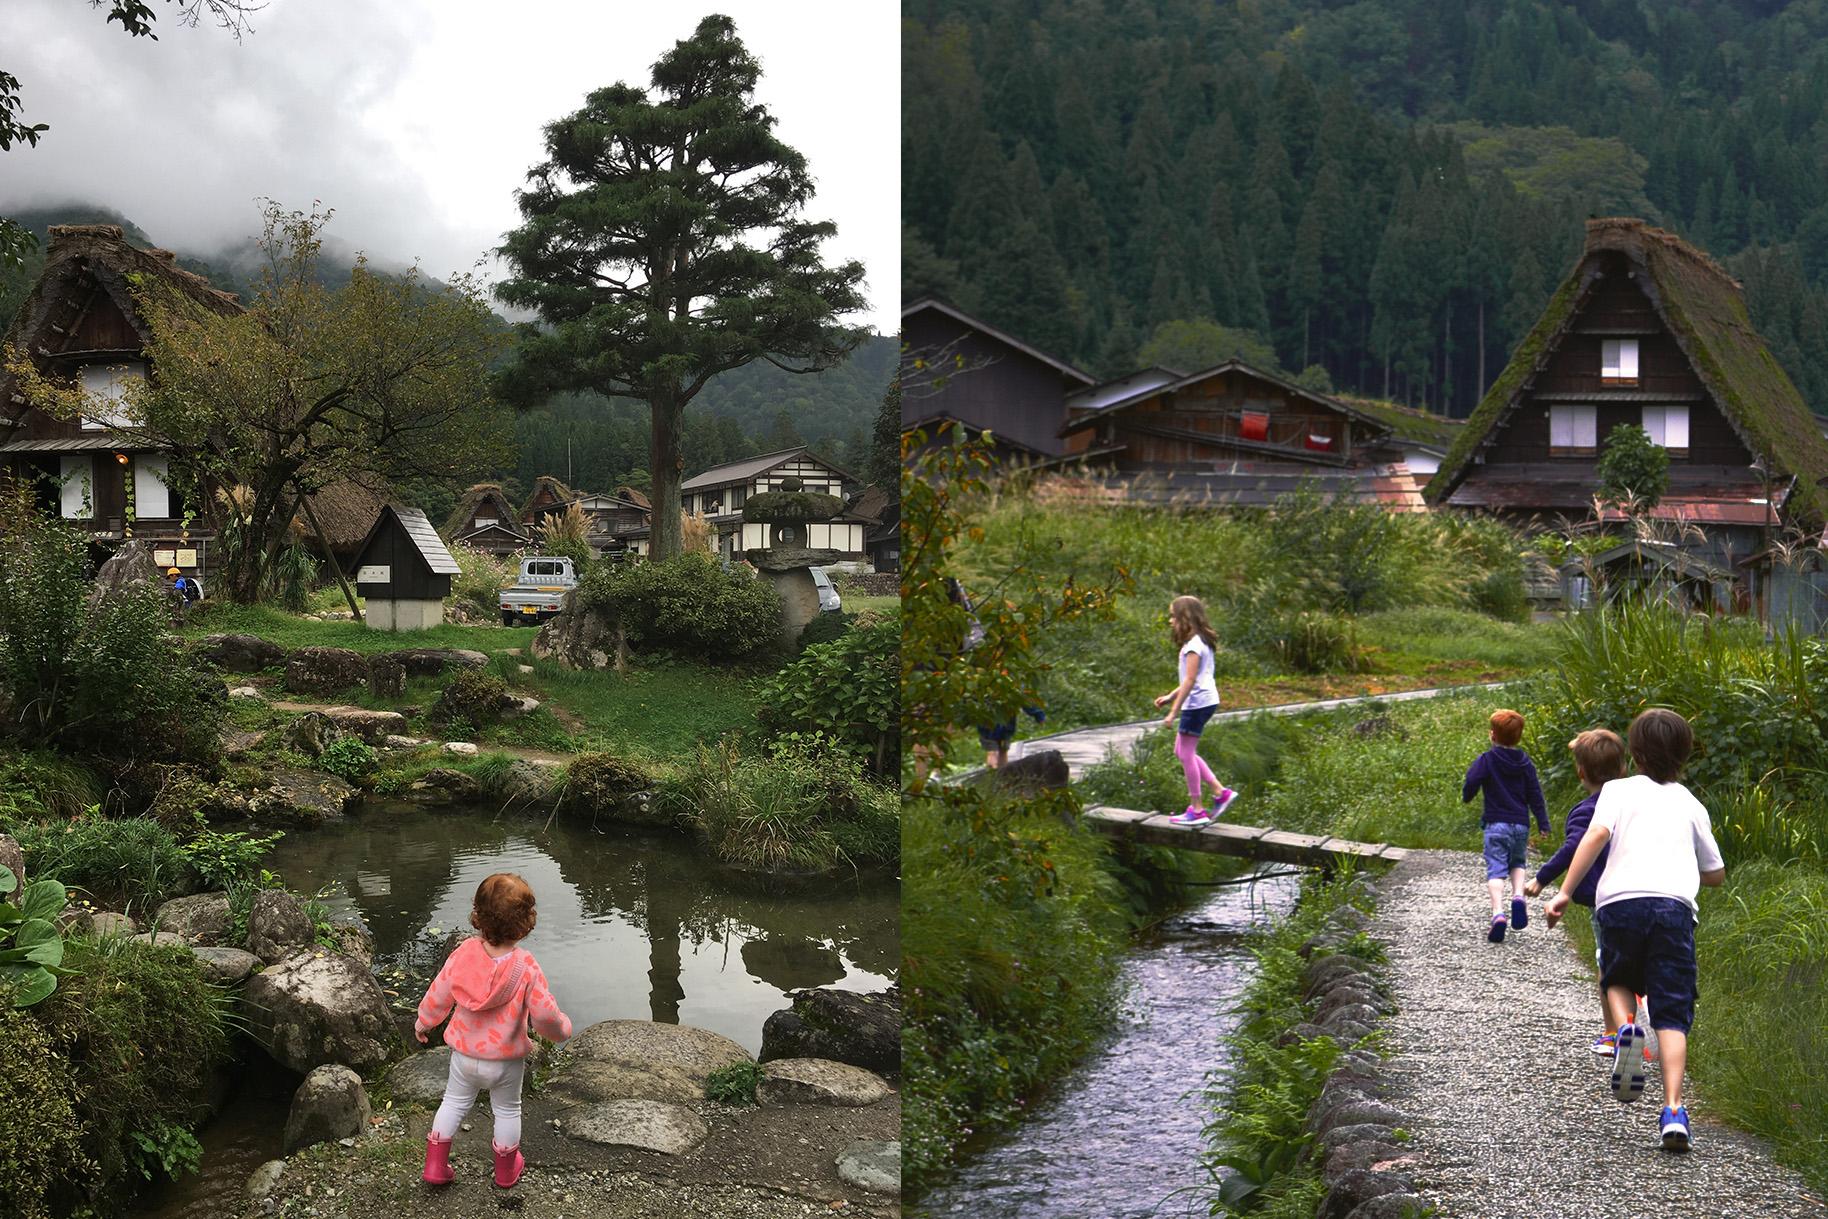 Fun and play in Ogimachi Village, Gifu Prefecture